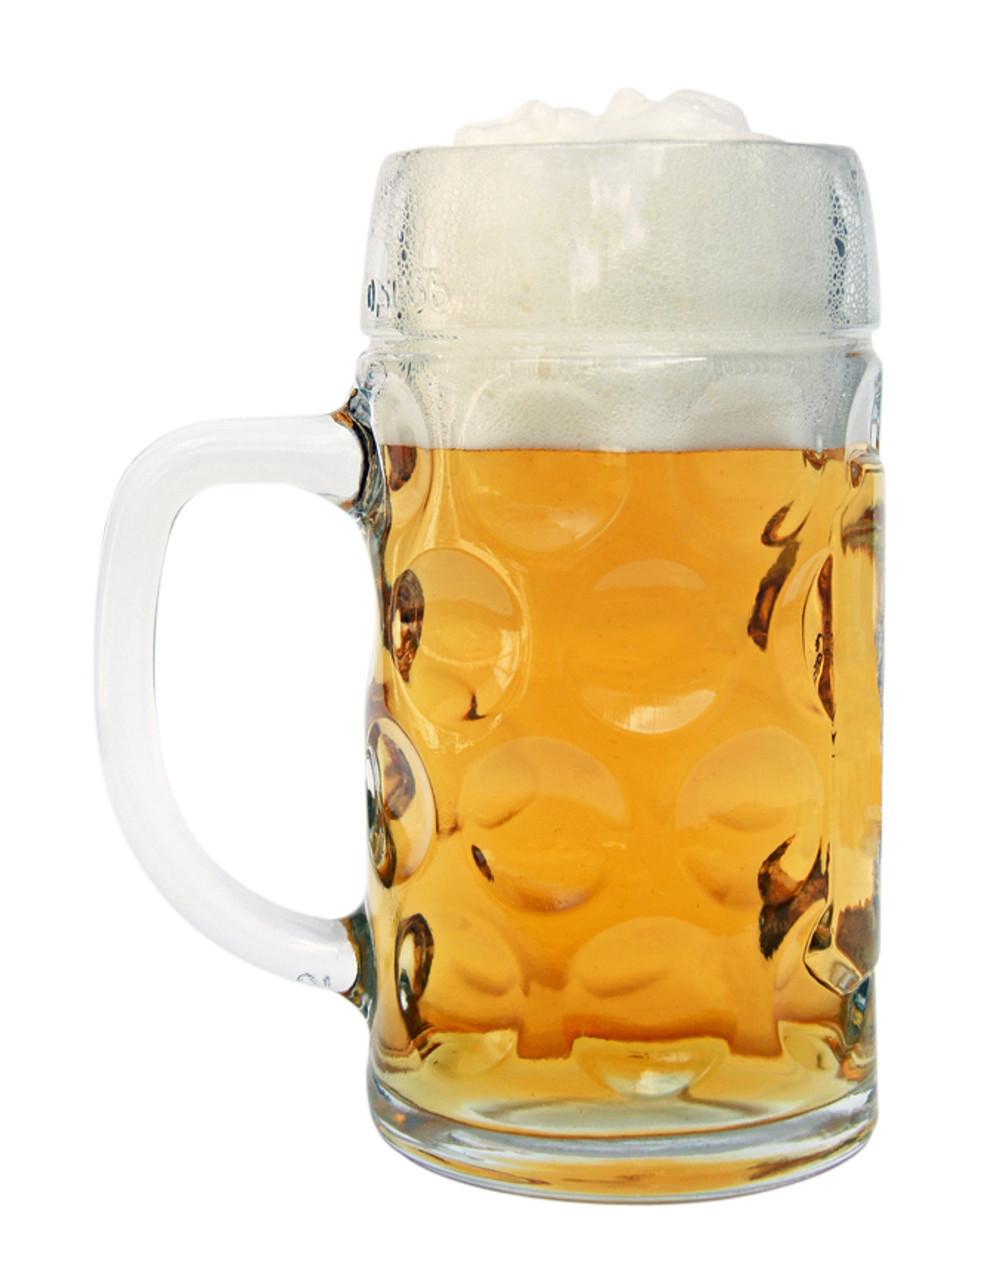 Authentic 0.5 Liter St Pauli Beer Glass